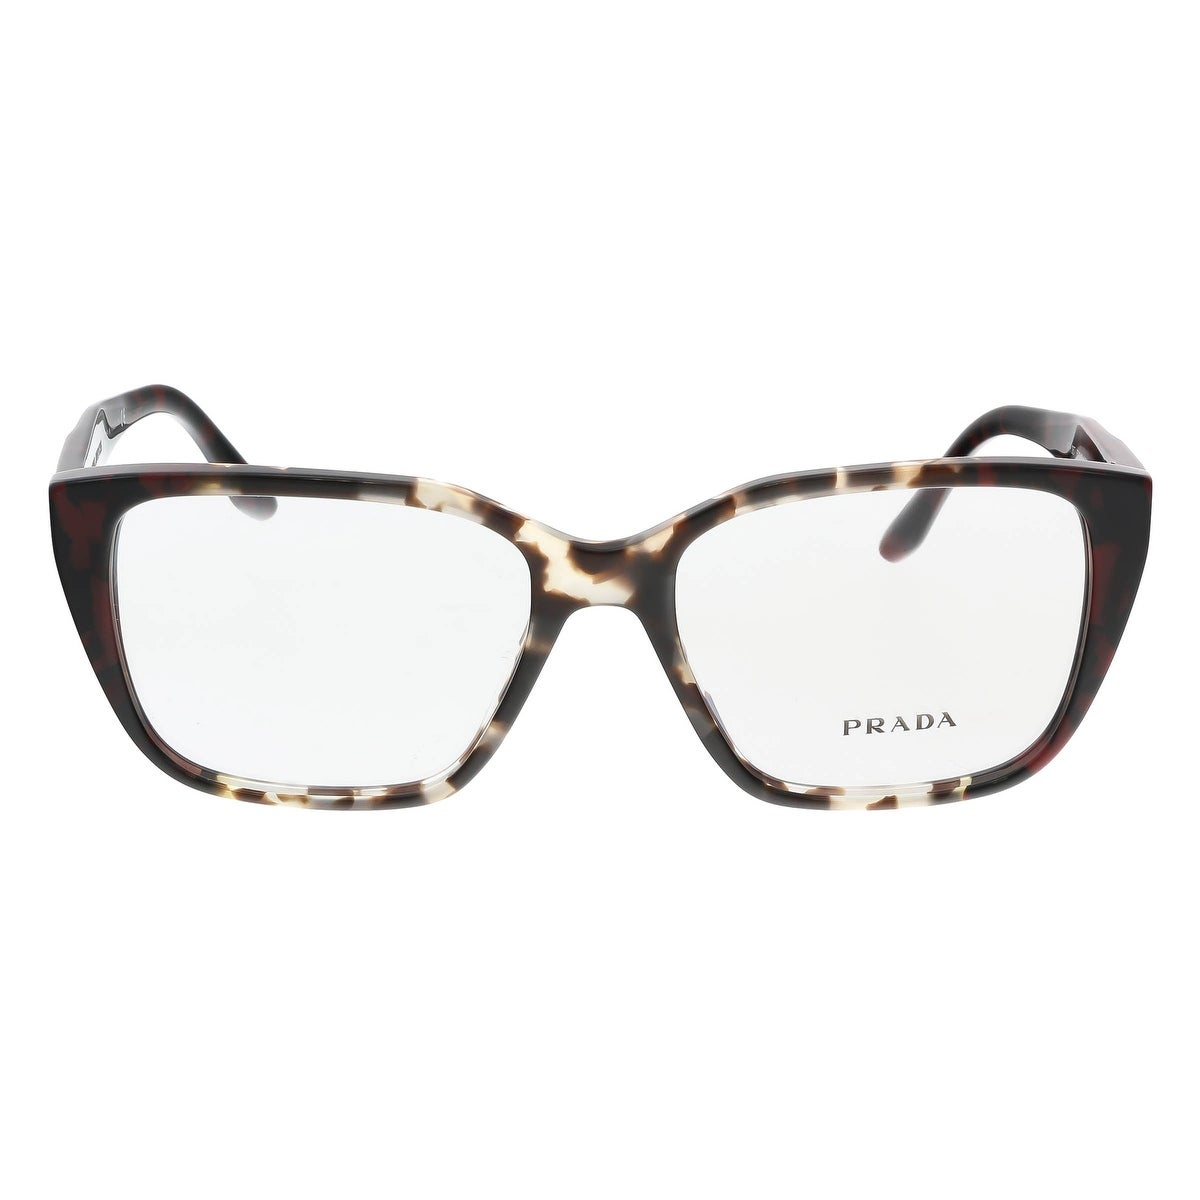 60d58d7ef78 Shop Prada PR 08TV U6K1O1 Spotted Brown Opal Square Optical Frames -  53-16-140 - Free Shipping Today - Overstock - 17768411